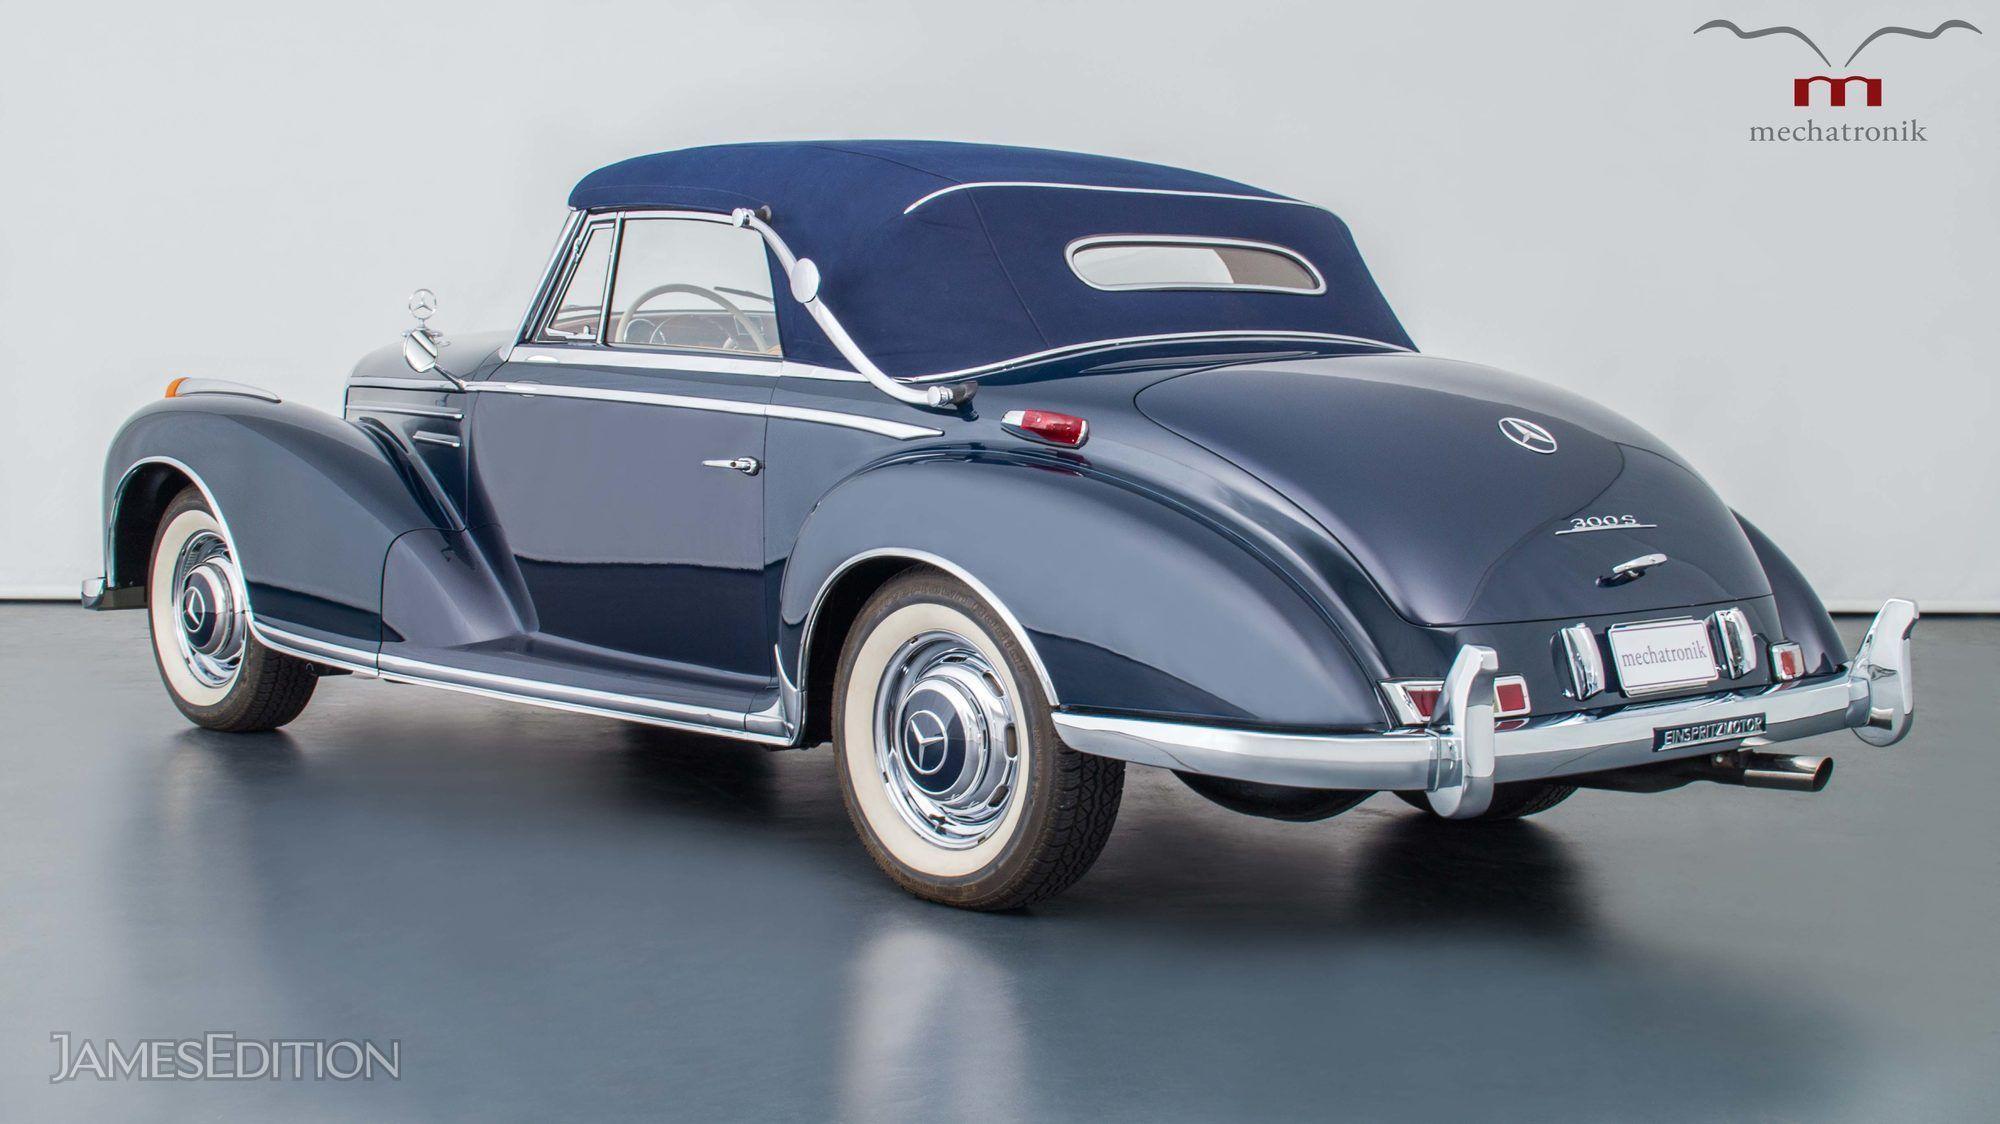 1956 Mercedes-Benz 300 in Pleidelsheim, Germany for sale (10425441)